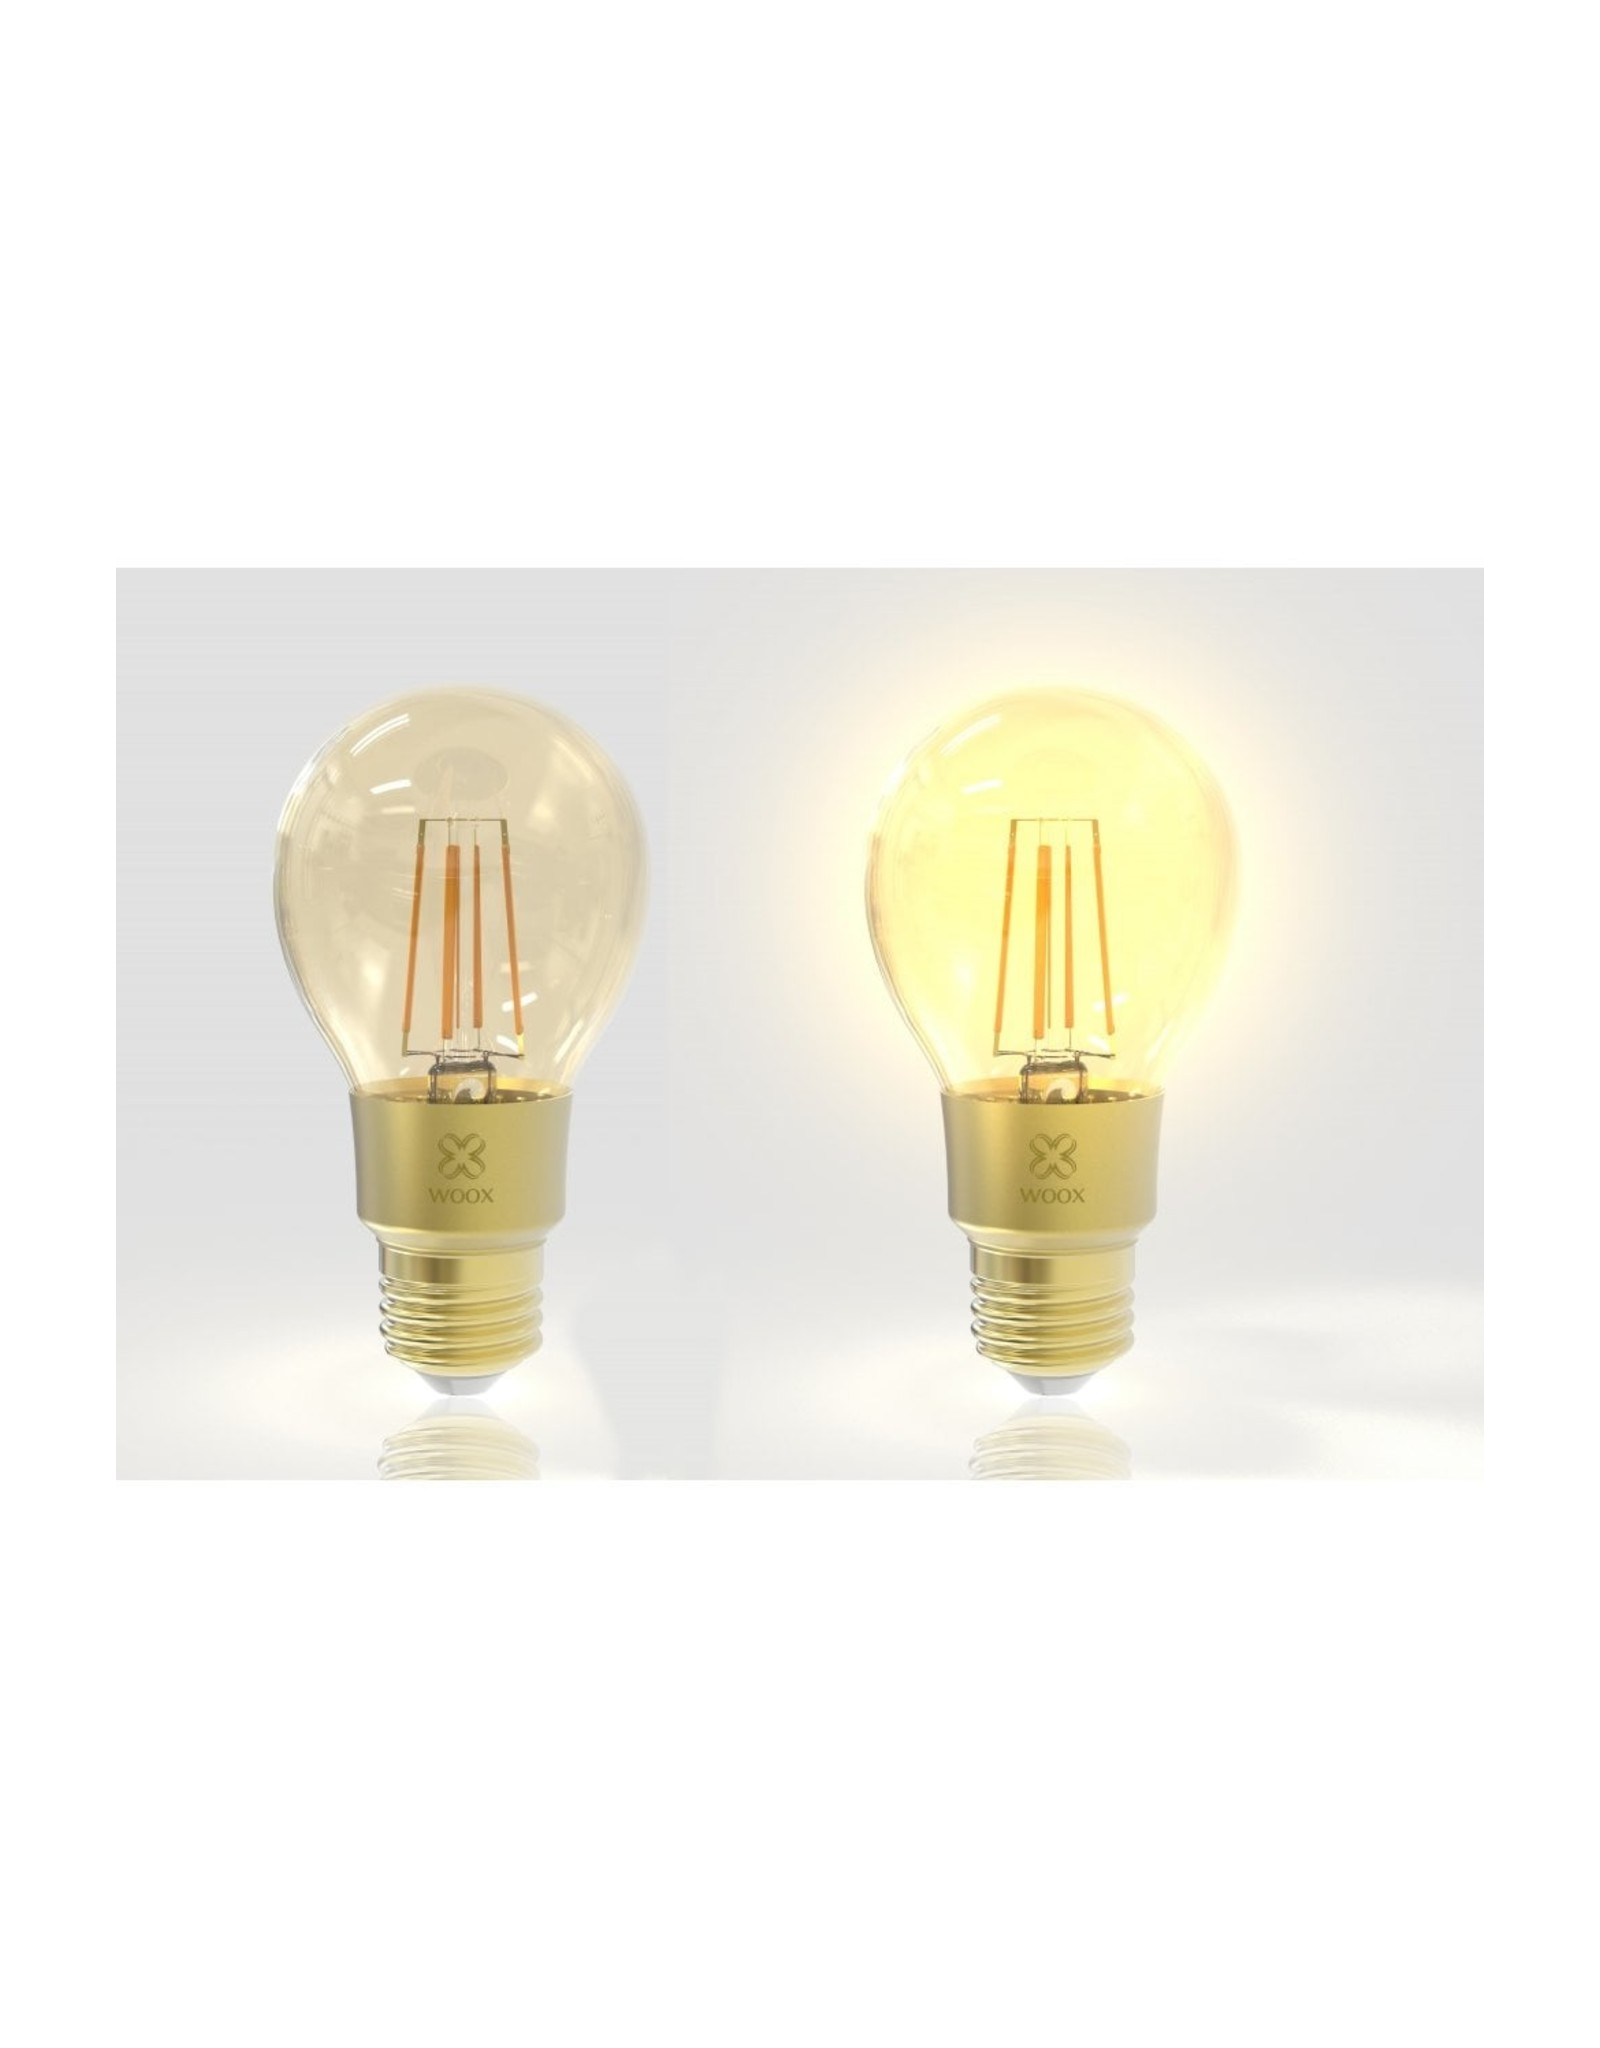 Woox Home Woox 3-Pack Smart Filament  Bulb | R9078